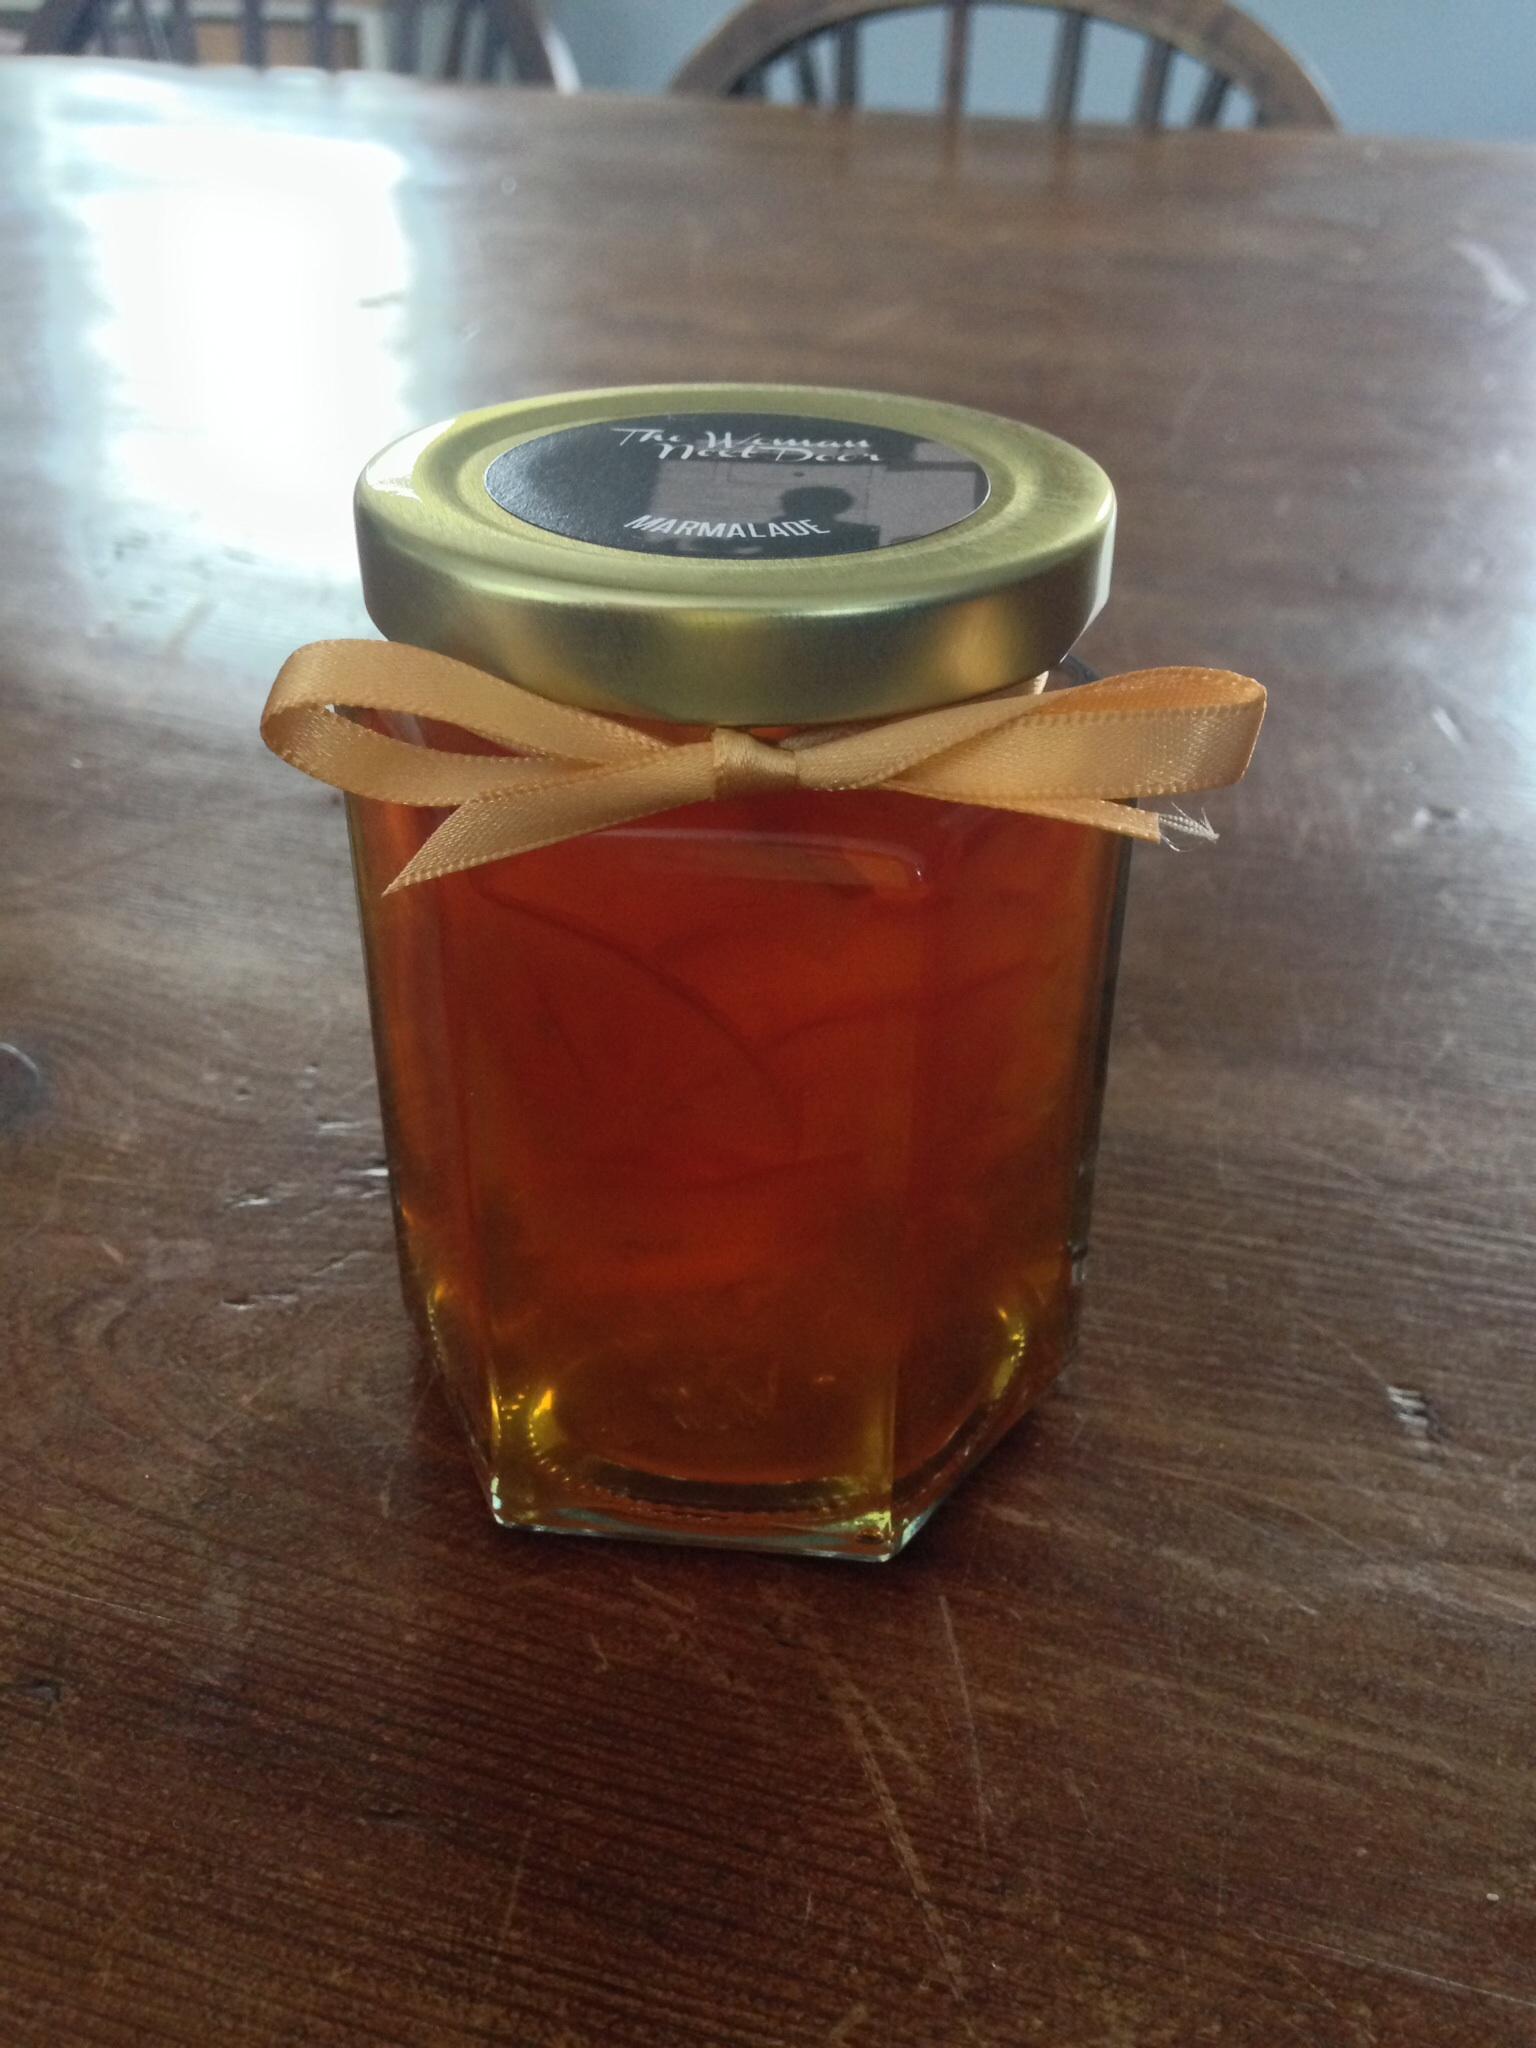 The Woman Next Door's hand-cut Seville orange marmalade.